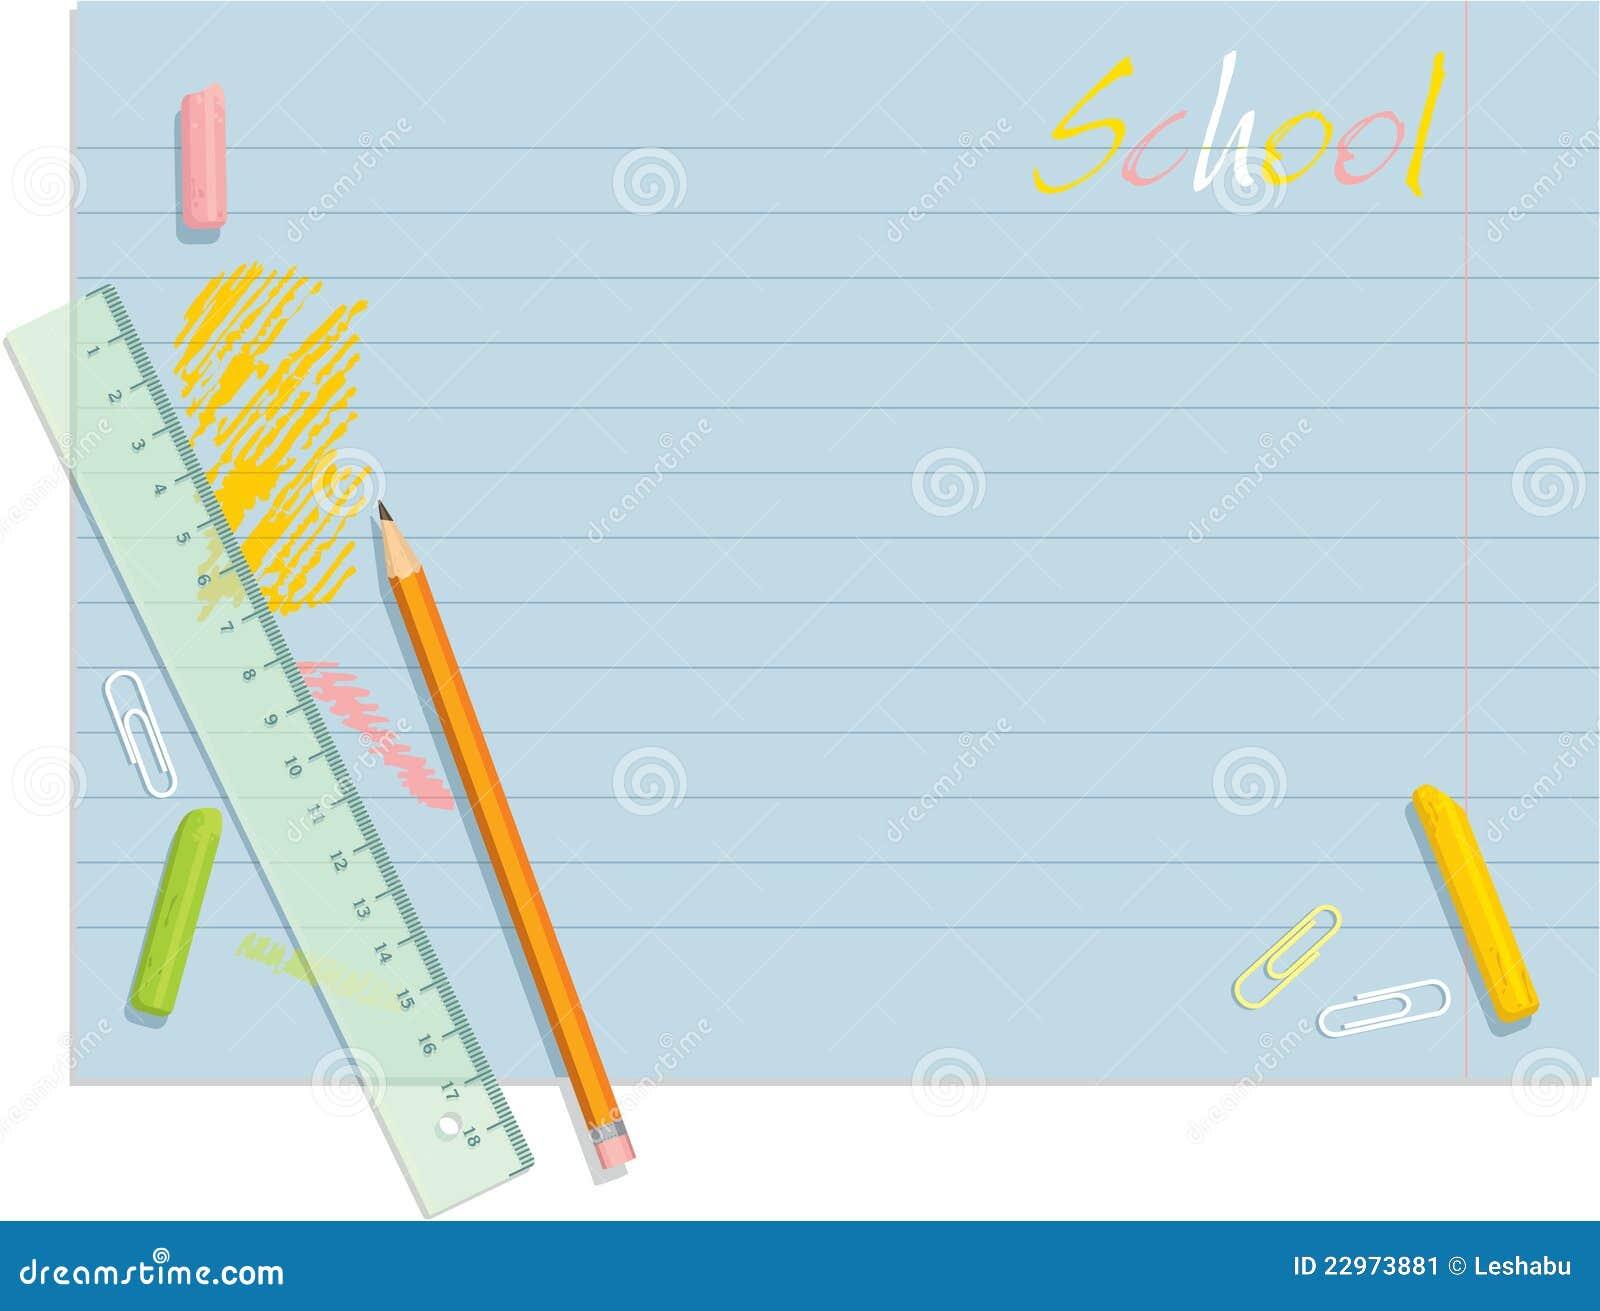 Pencil Paper Icon School Schedule Backgr...